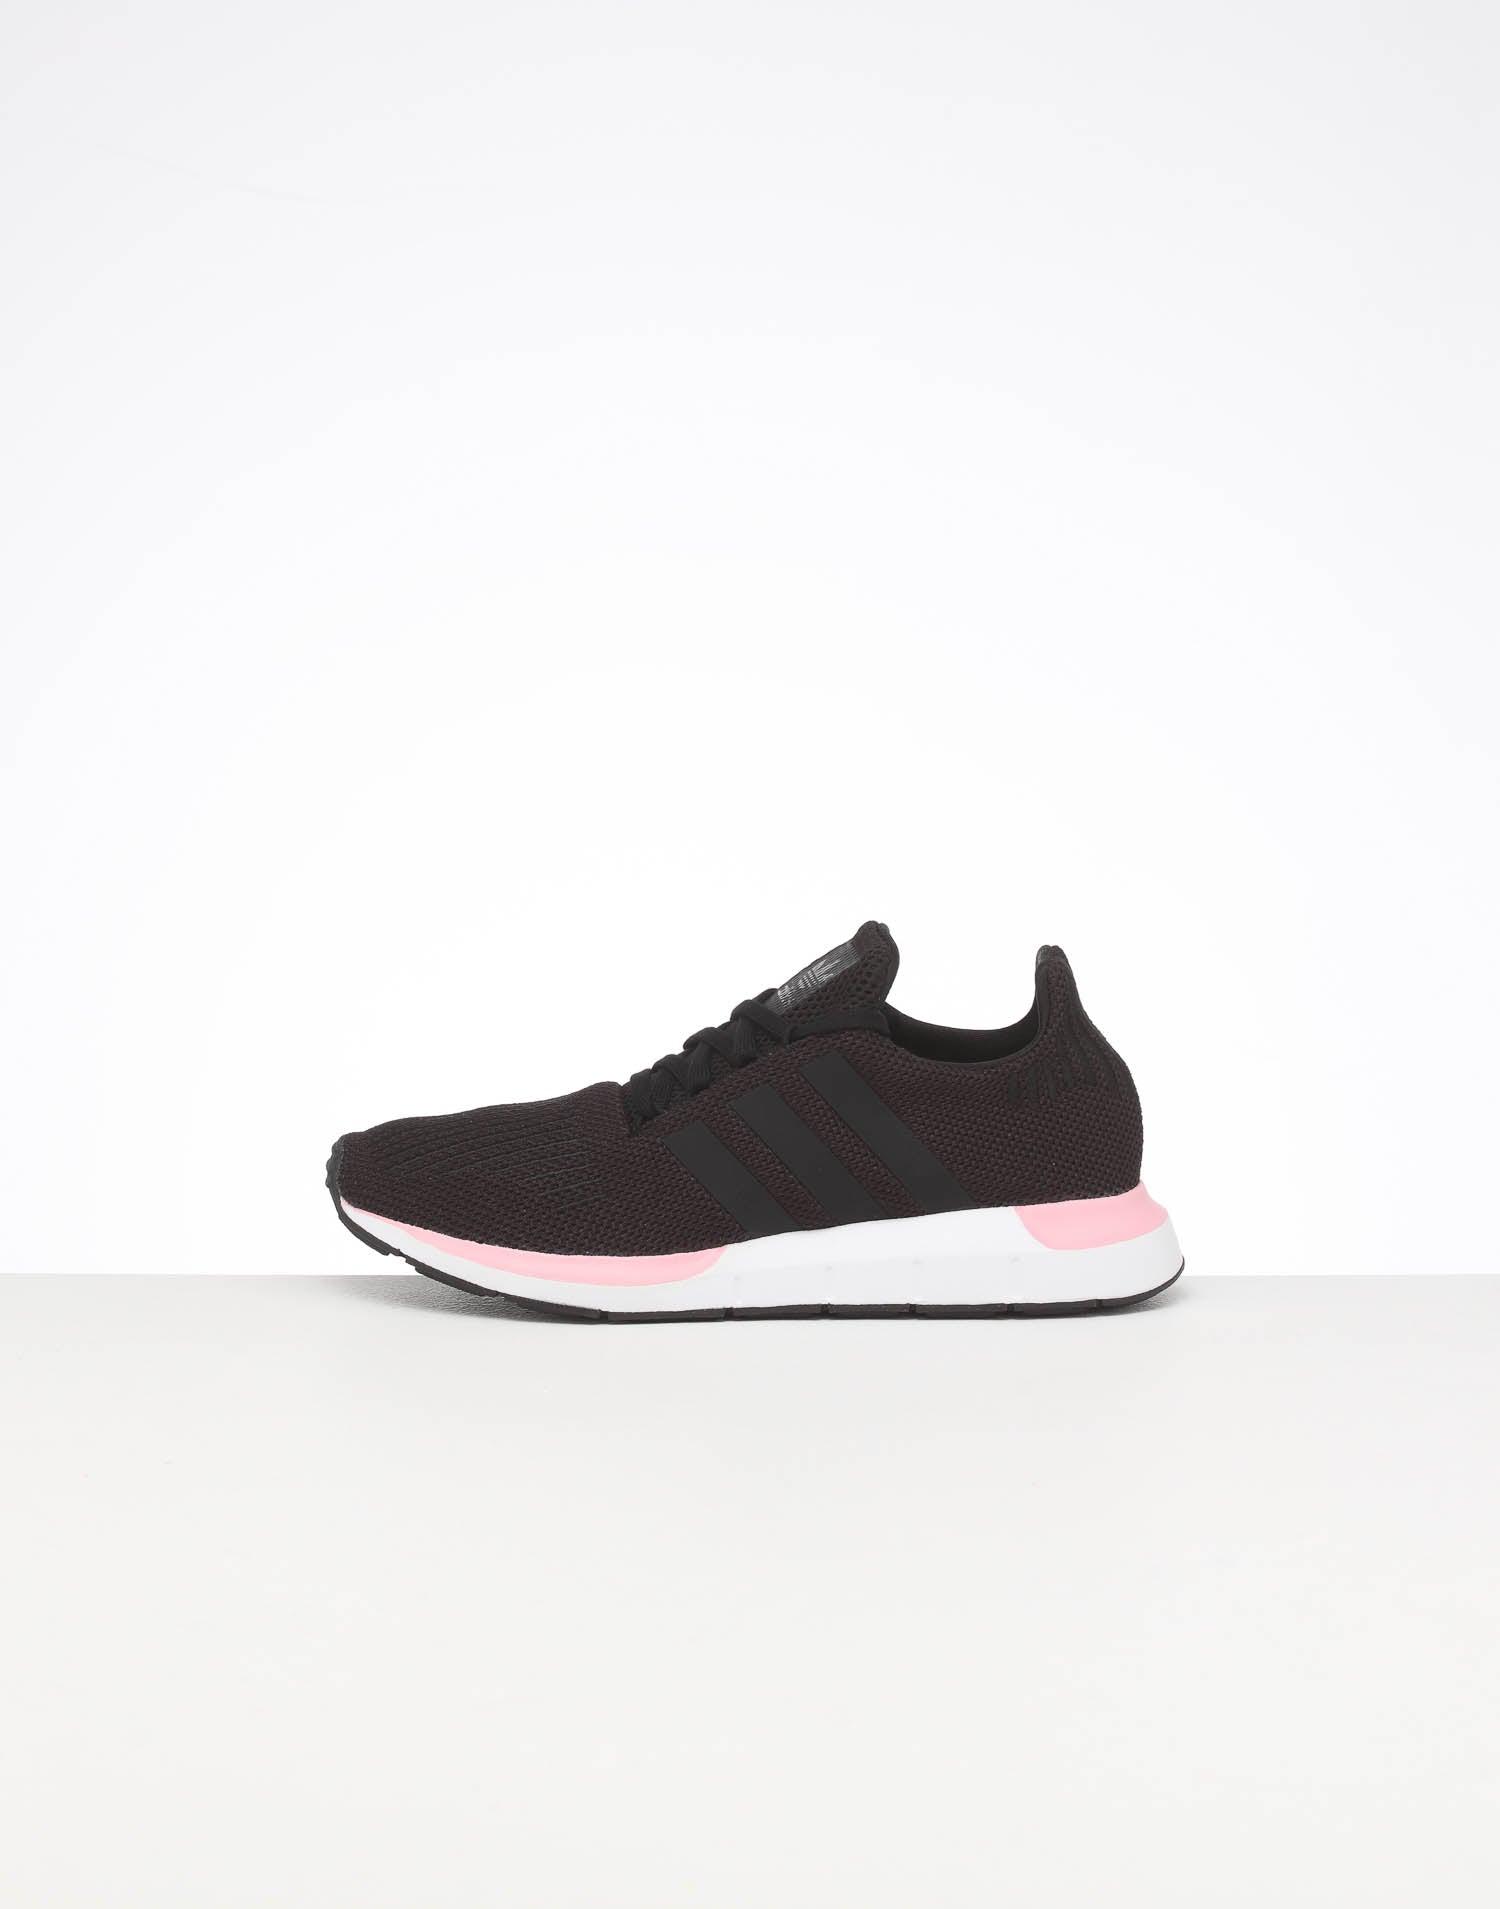 adidas women's swift run pink